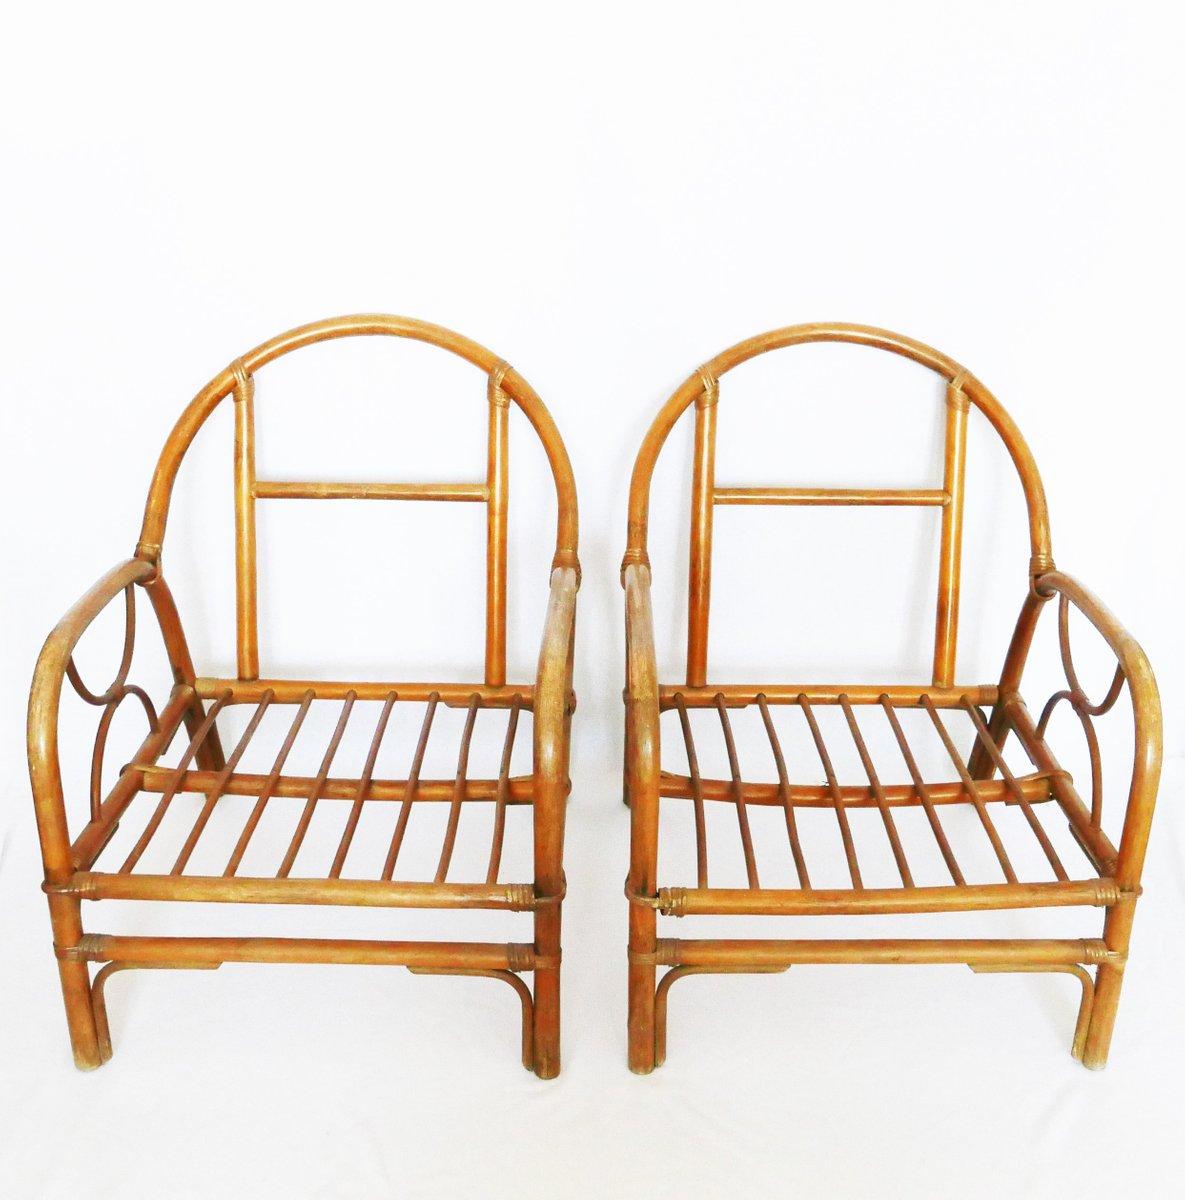 fauteuils vintage en bambou france en vente sur pamono. Black Bedroom Furniture Sets. Home Design Ideas